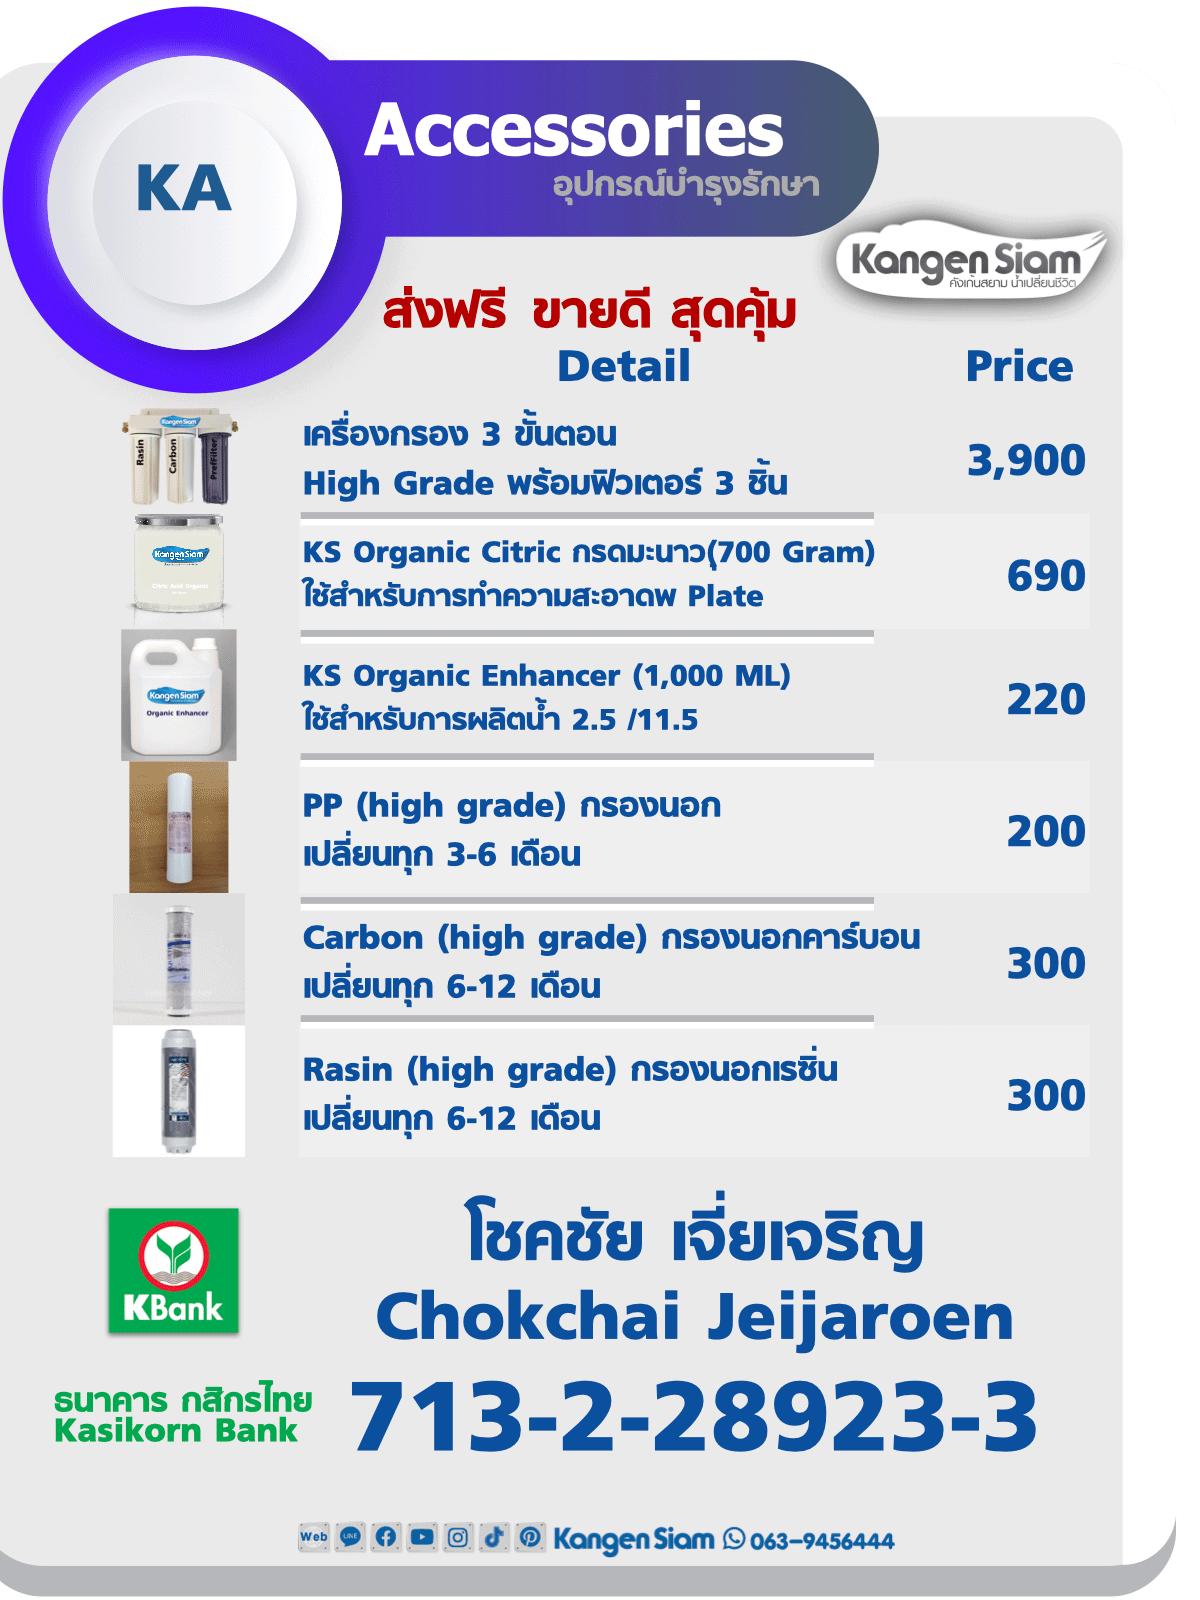 KangenSiam Product